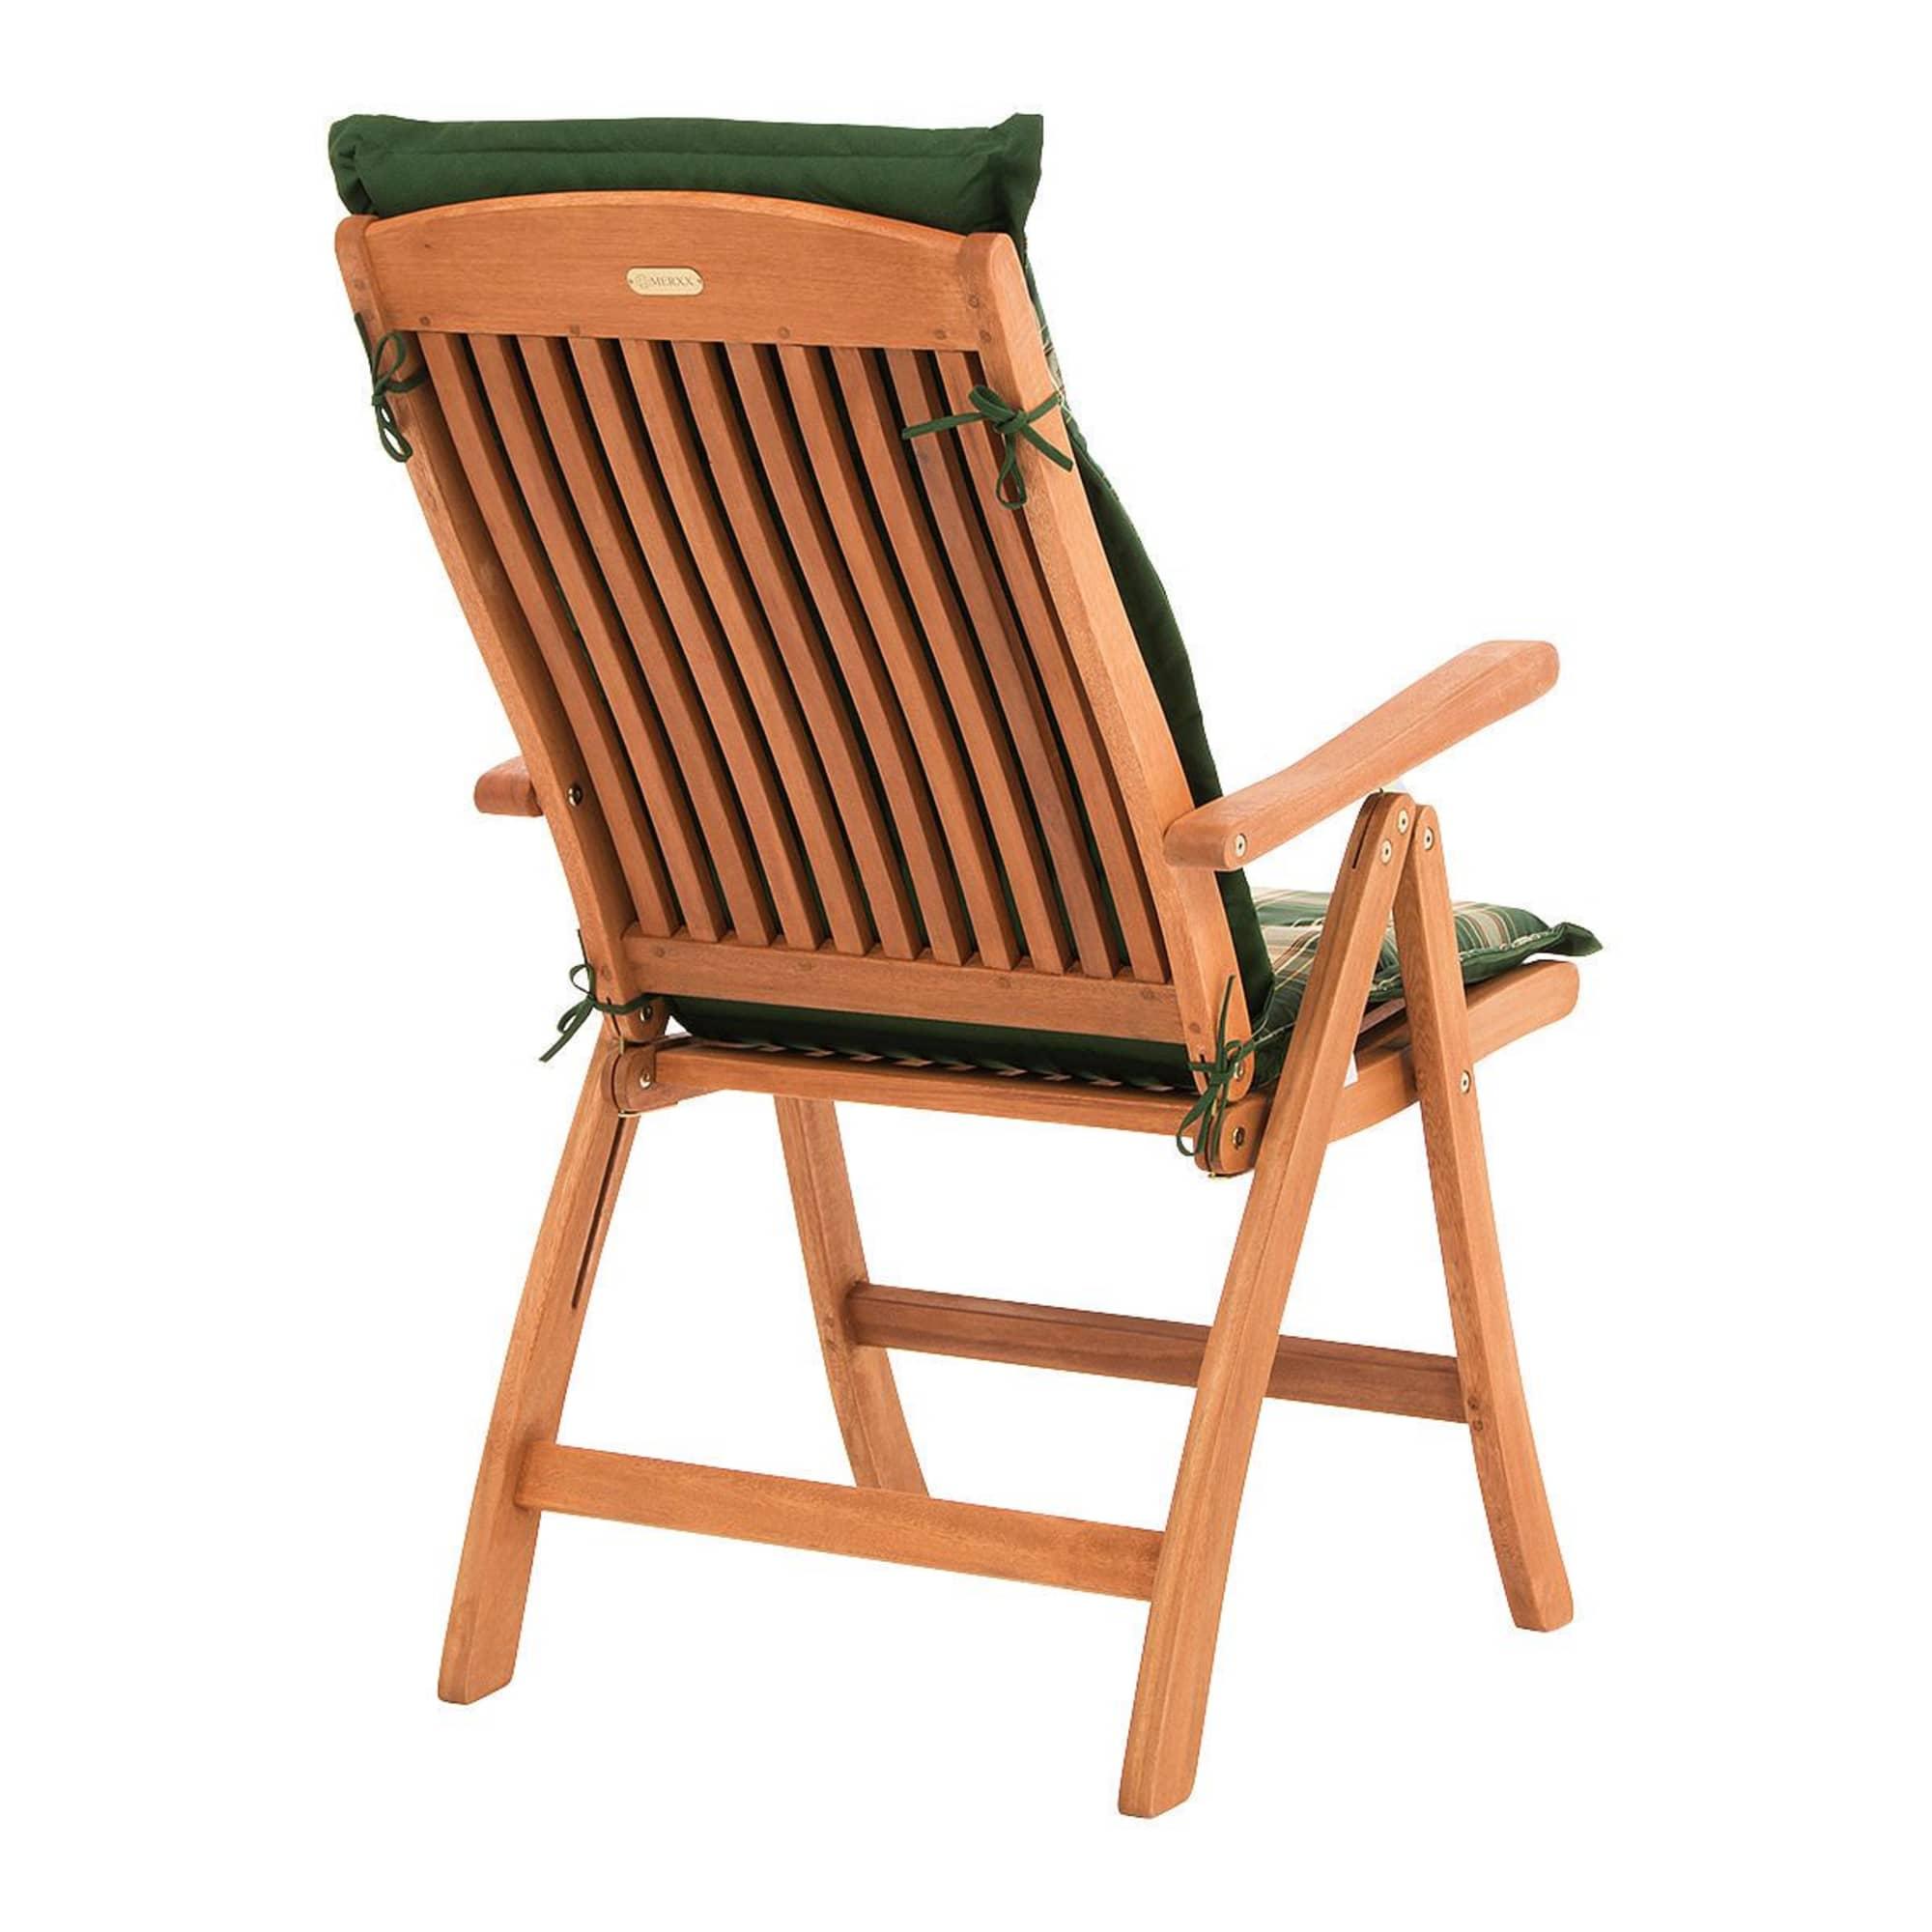 Genial Luxus Gartenstuhl Metall Holz Design